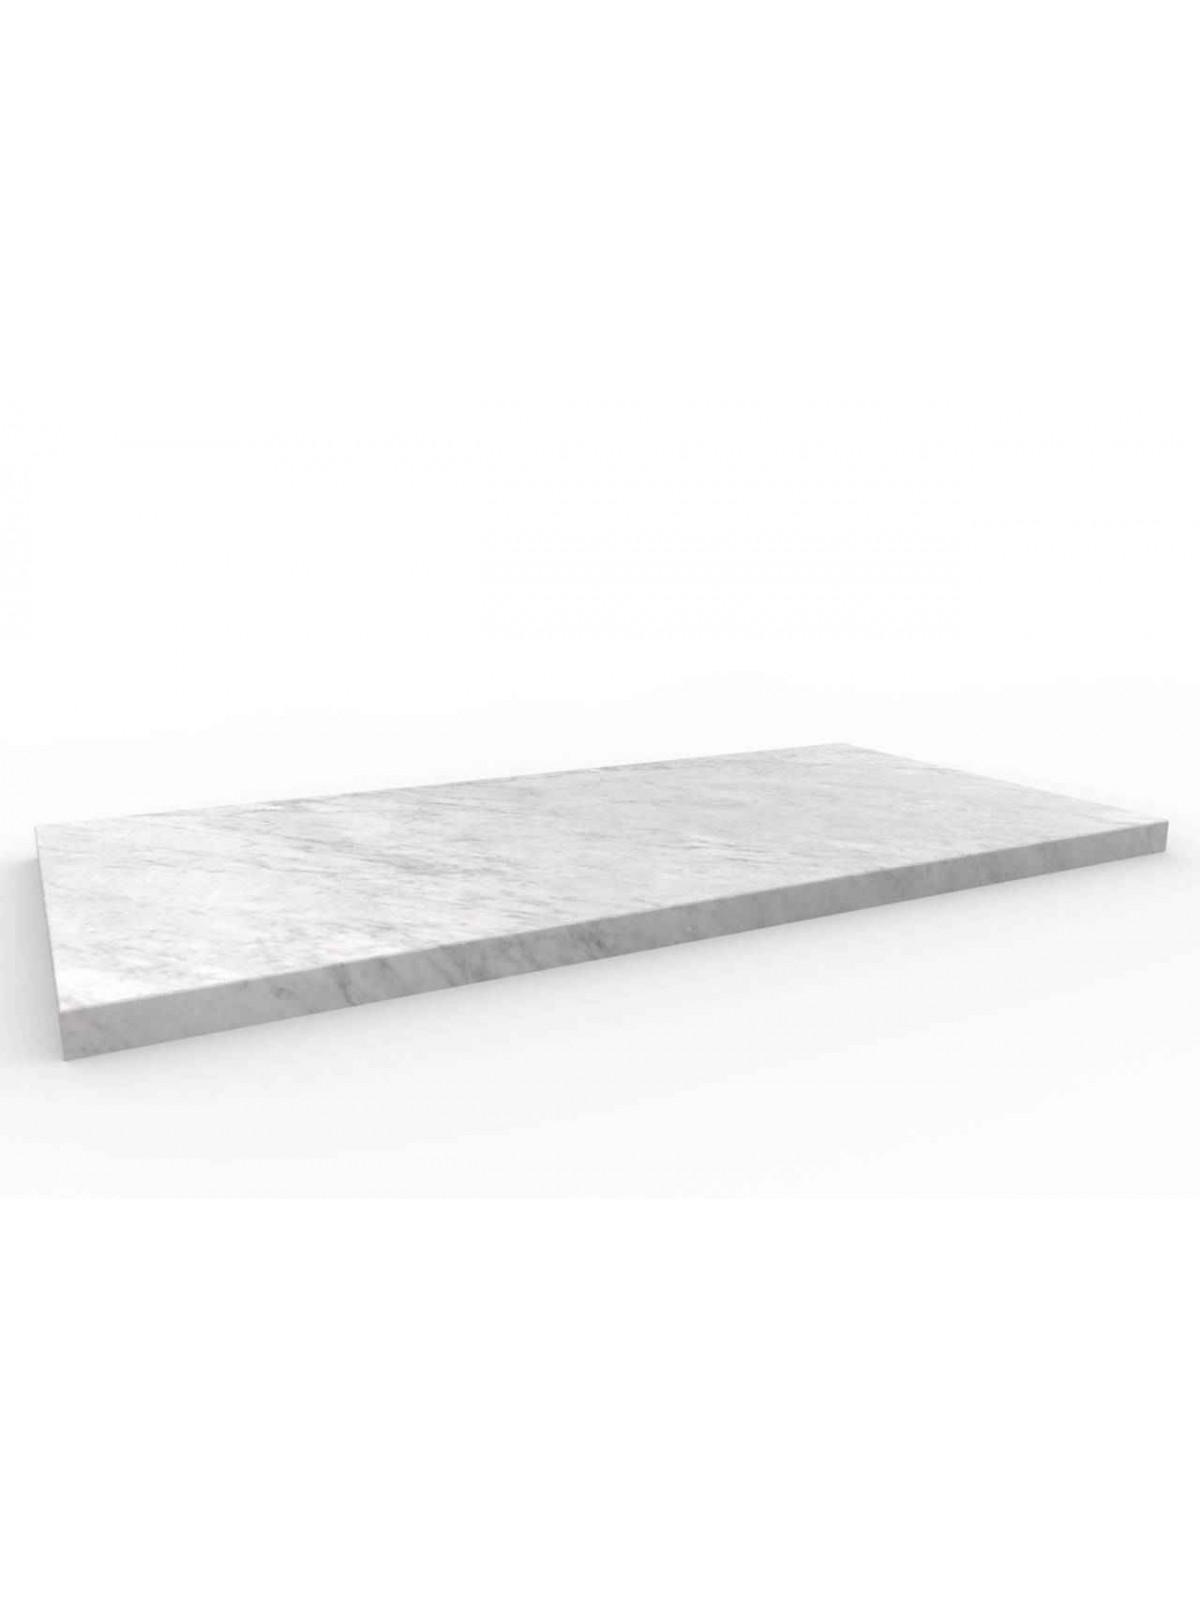 Posadzka z Bianco di Carrara 60x30 cm